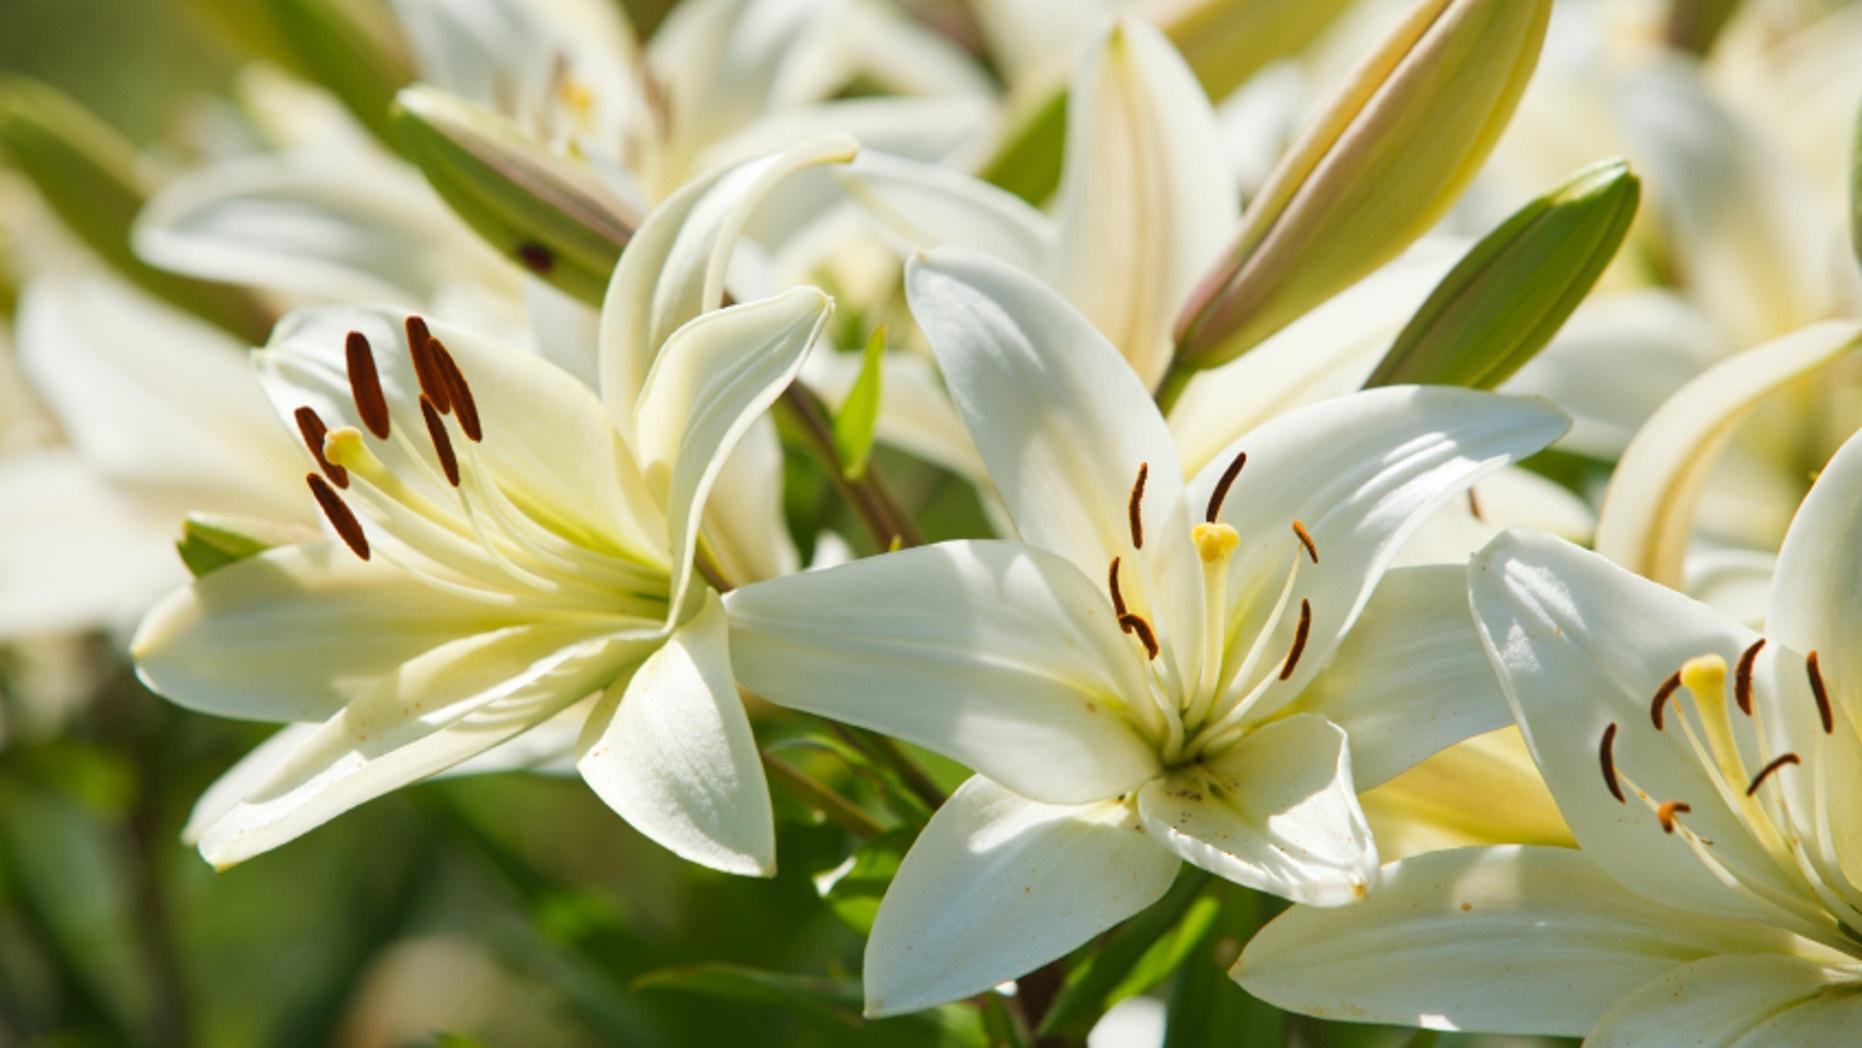 White lilies in a garden